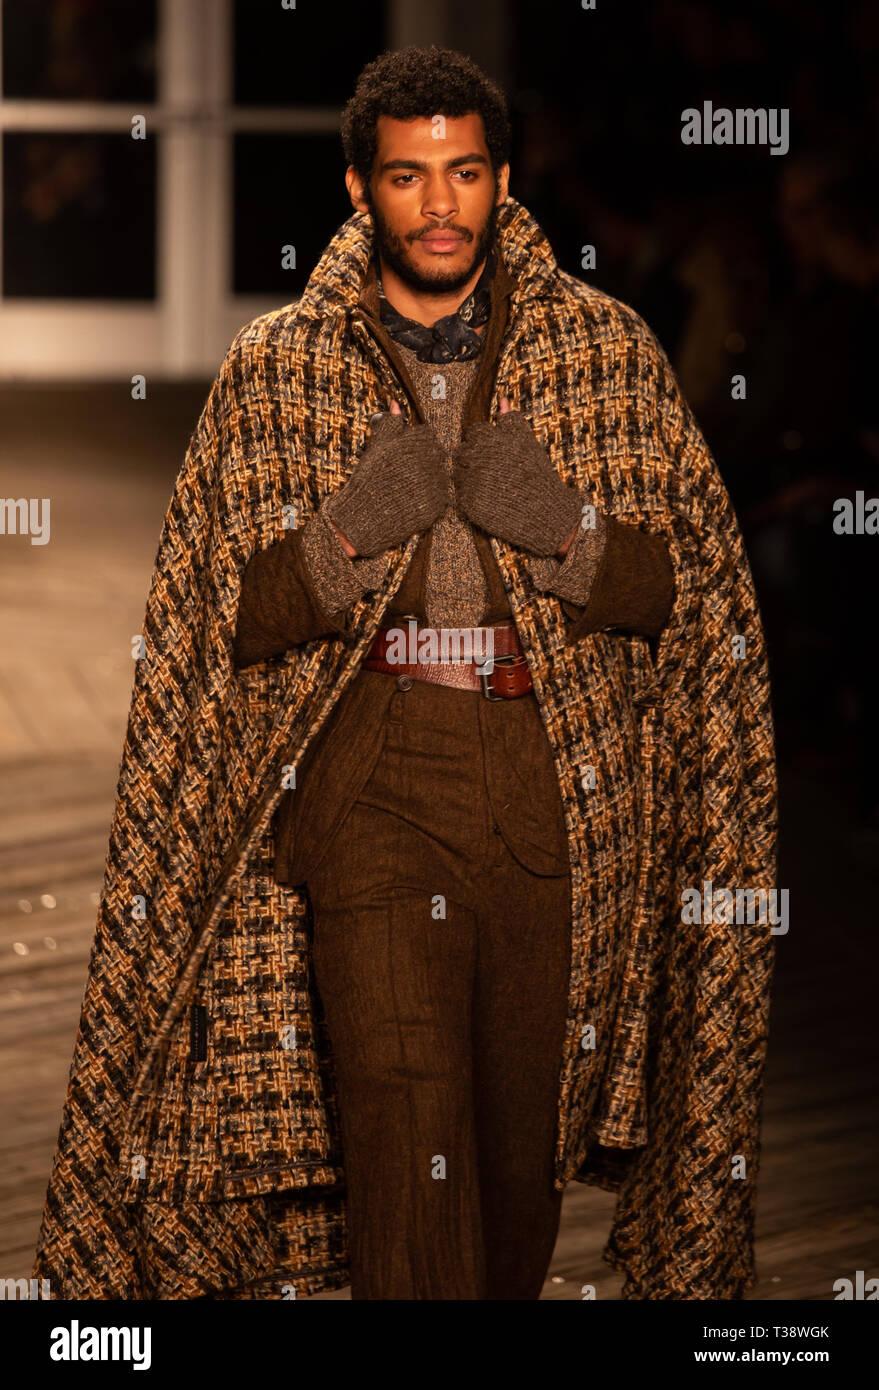 Joseph Abboud Mens Fall 2019 Runway Show - Stock Image